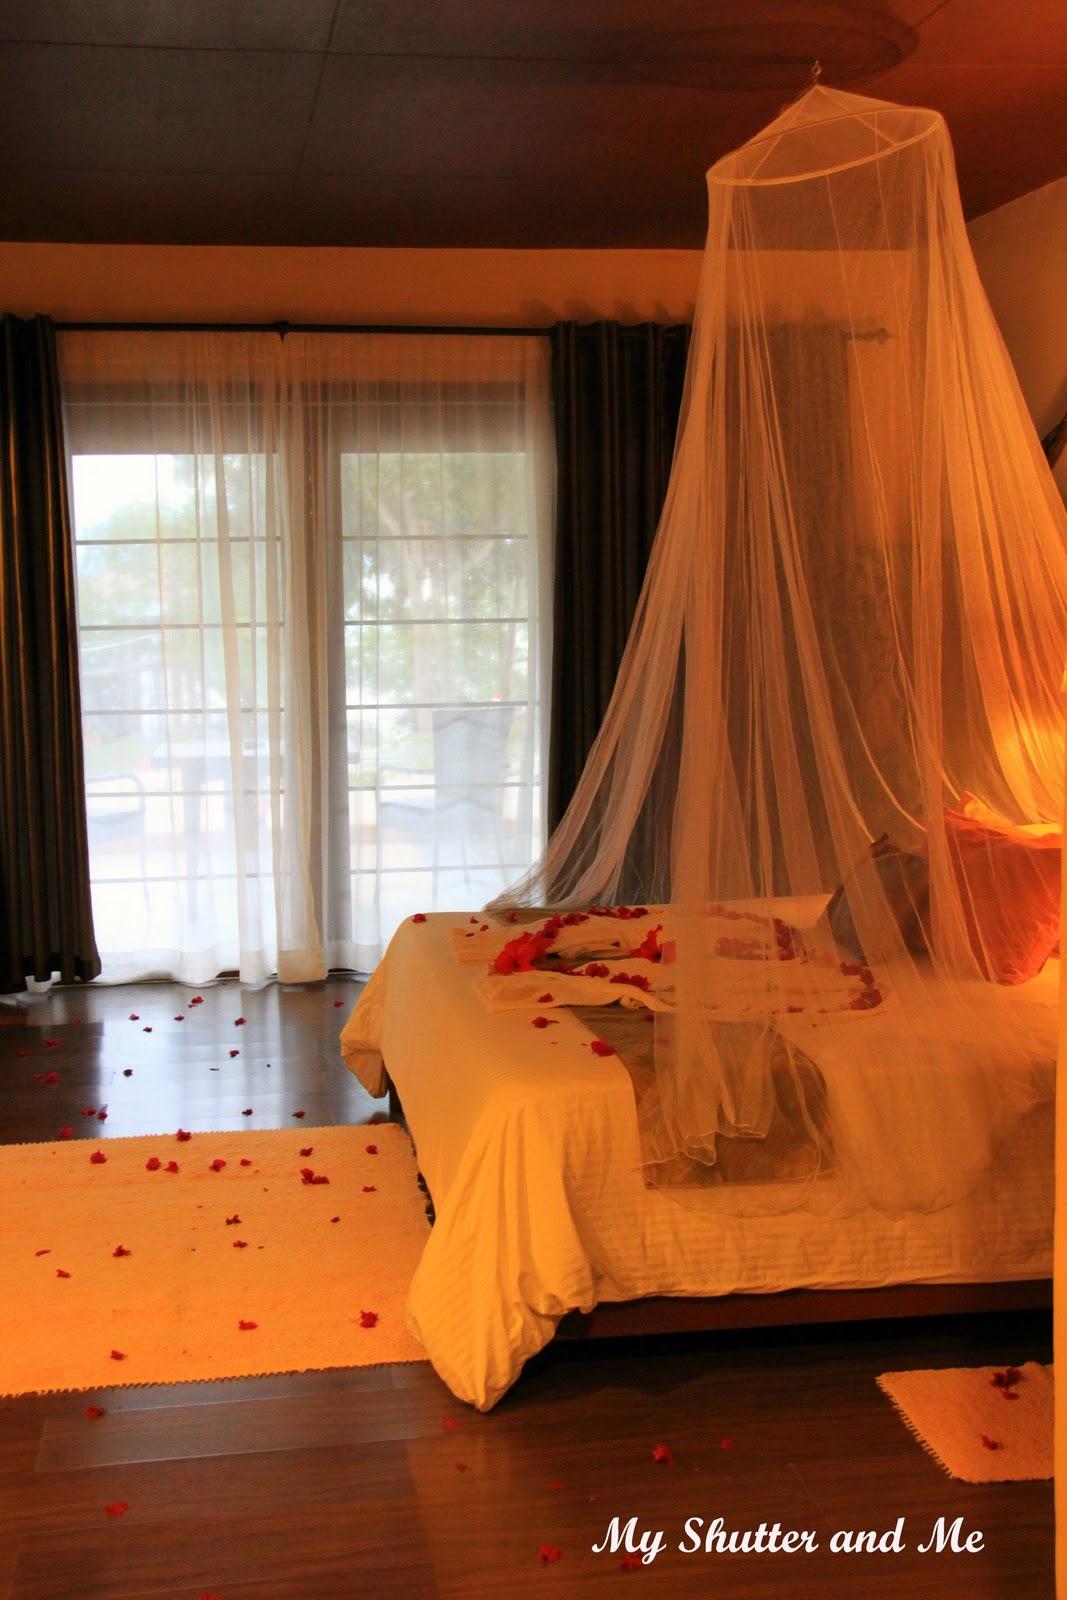 Hotel Room Decoration: Wedding Night Hotel Room Decorations